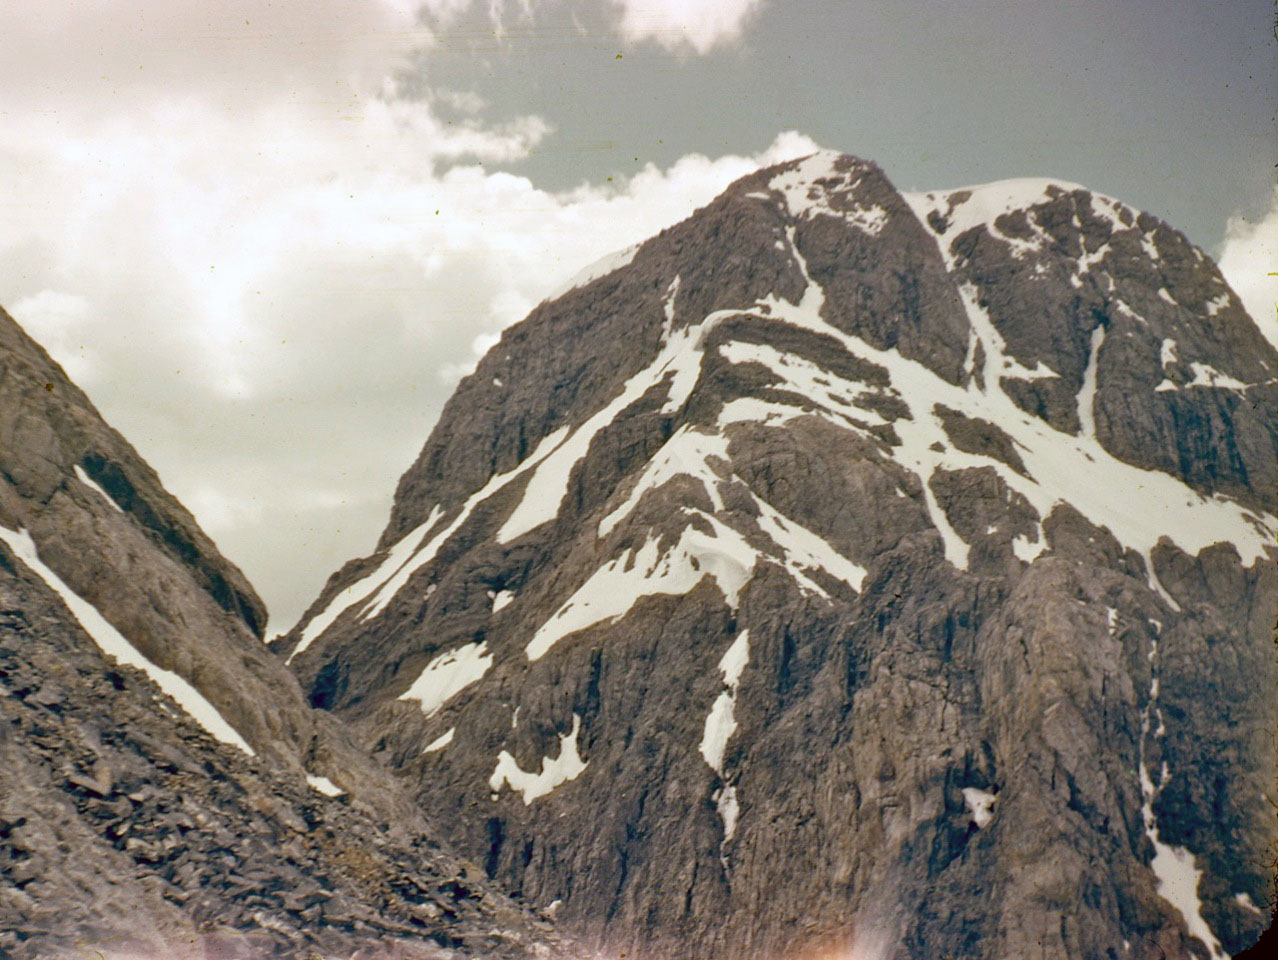 Looking up at the Northeast ridge and summit block (far left). Photo - Lyman Dye